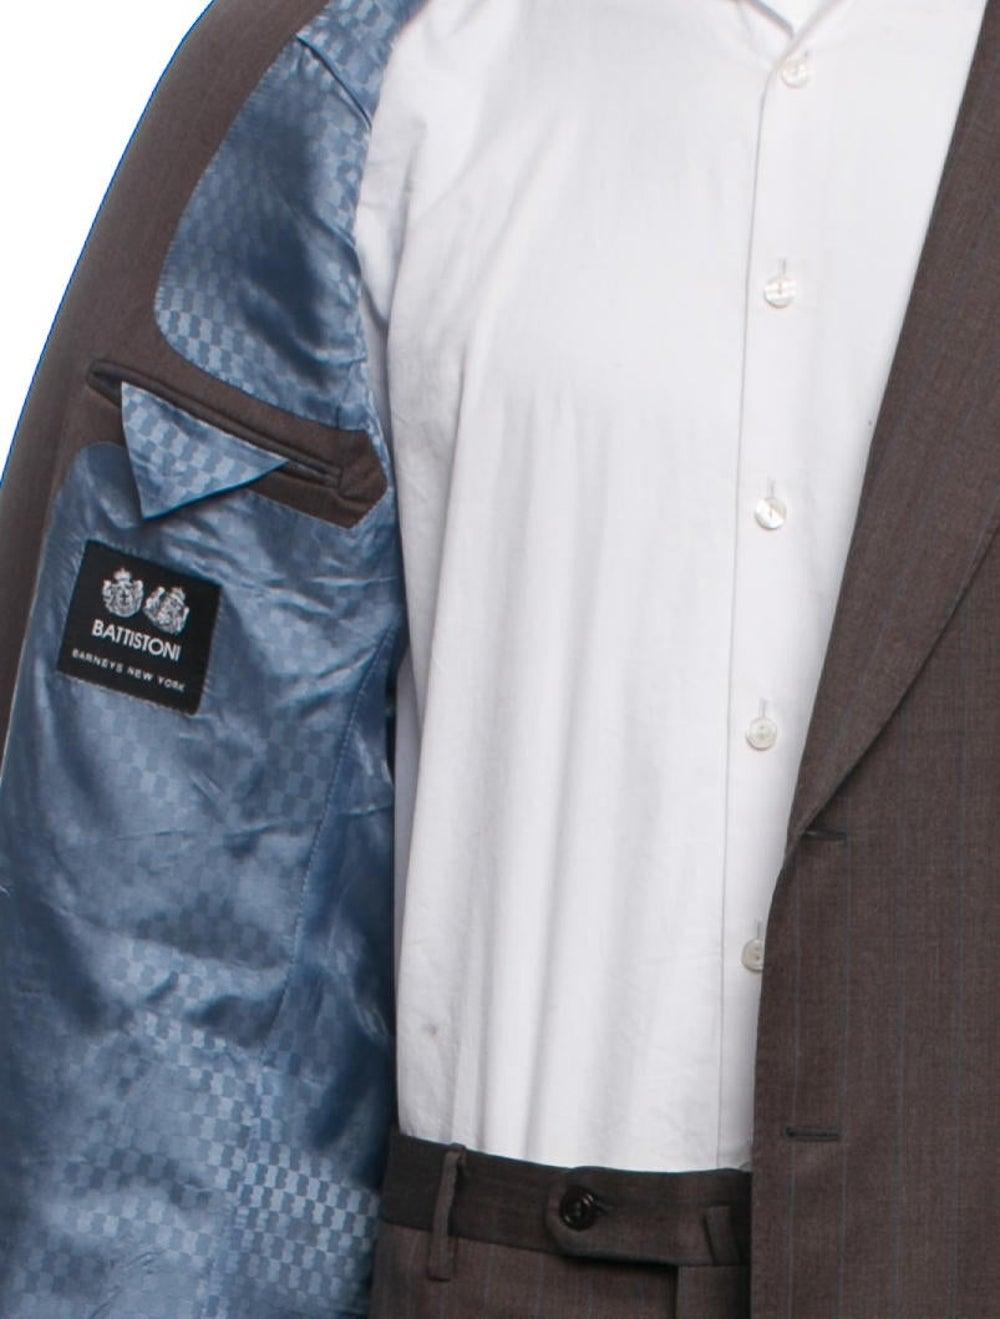 Battistoni Silk-Blend Pinstriped Two-Piece Suit - image 5